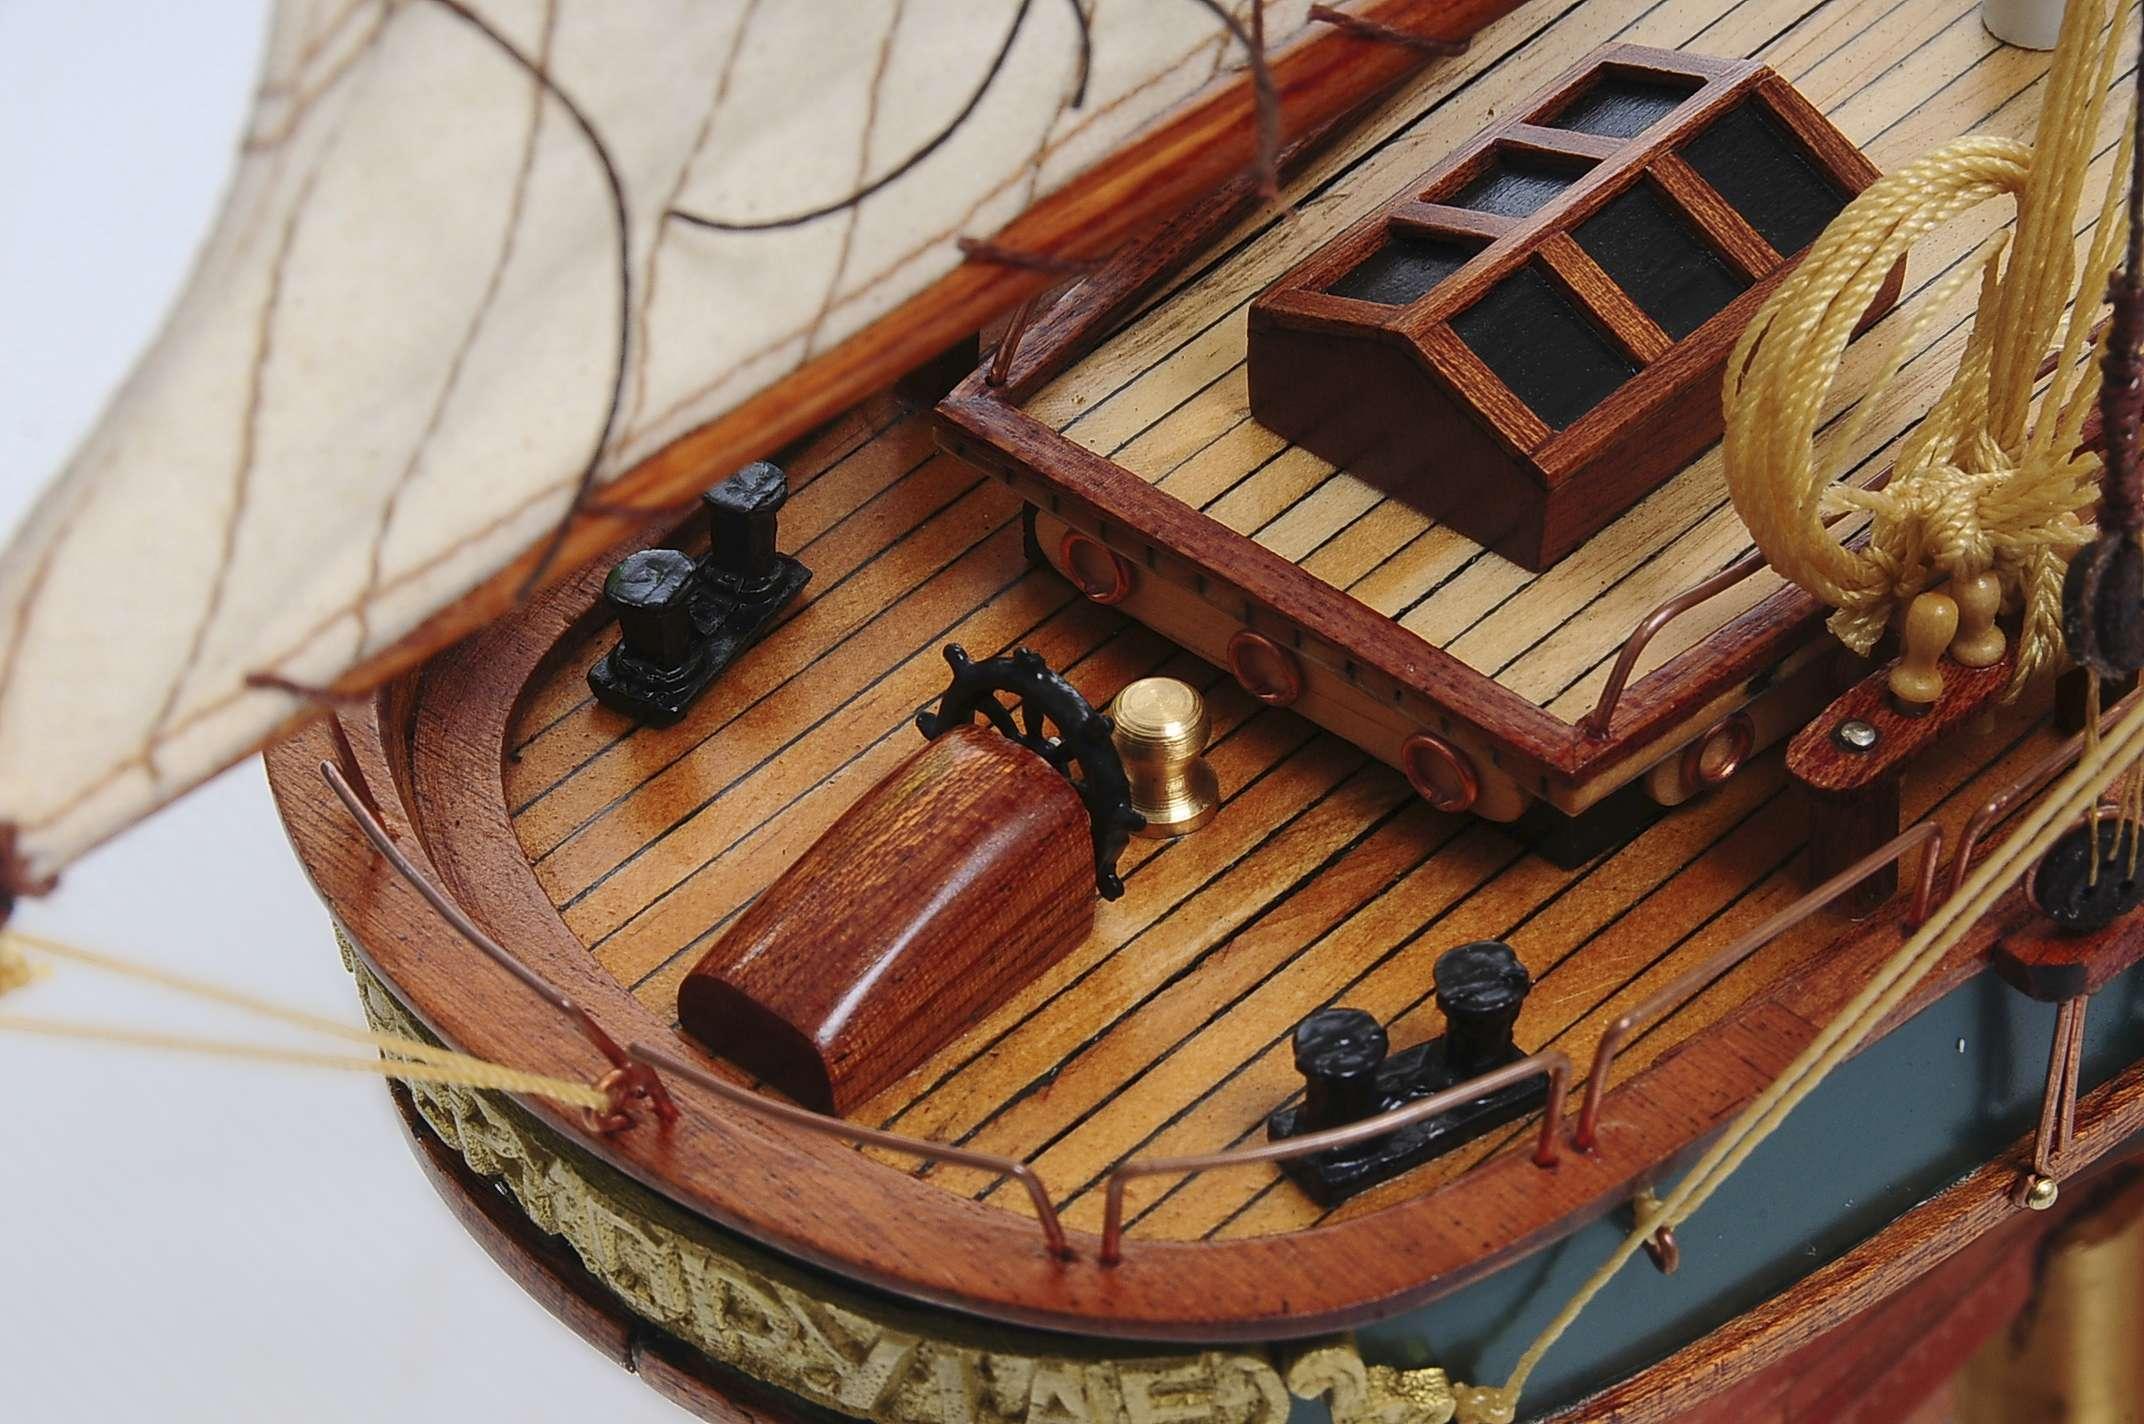 1434-4864-Thermopylae-Model-Boat